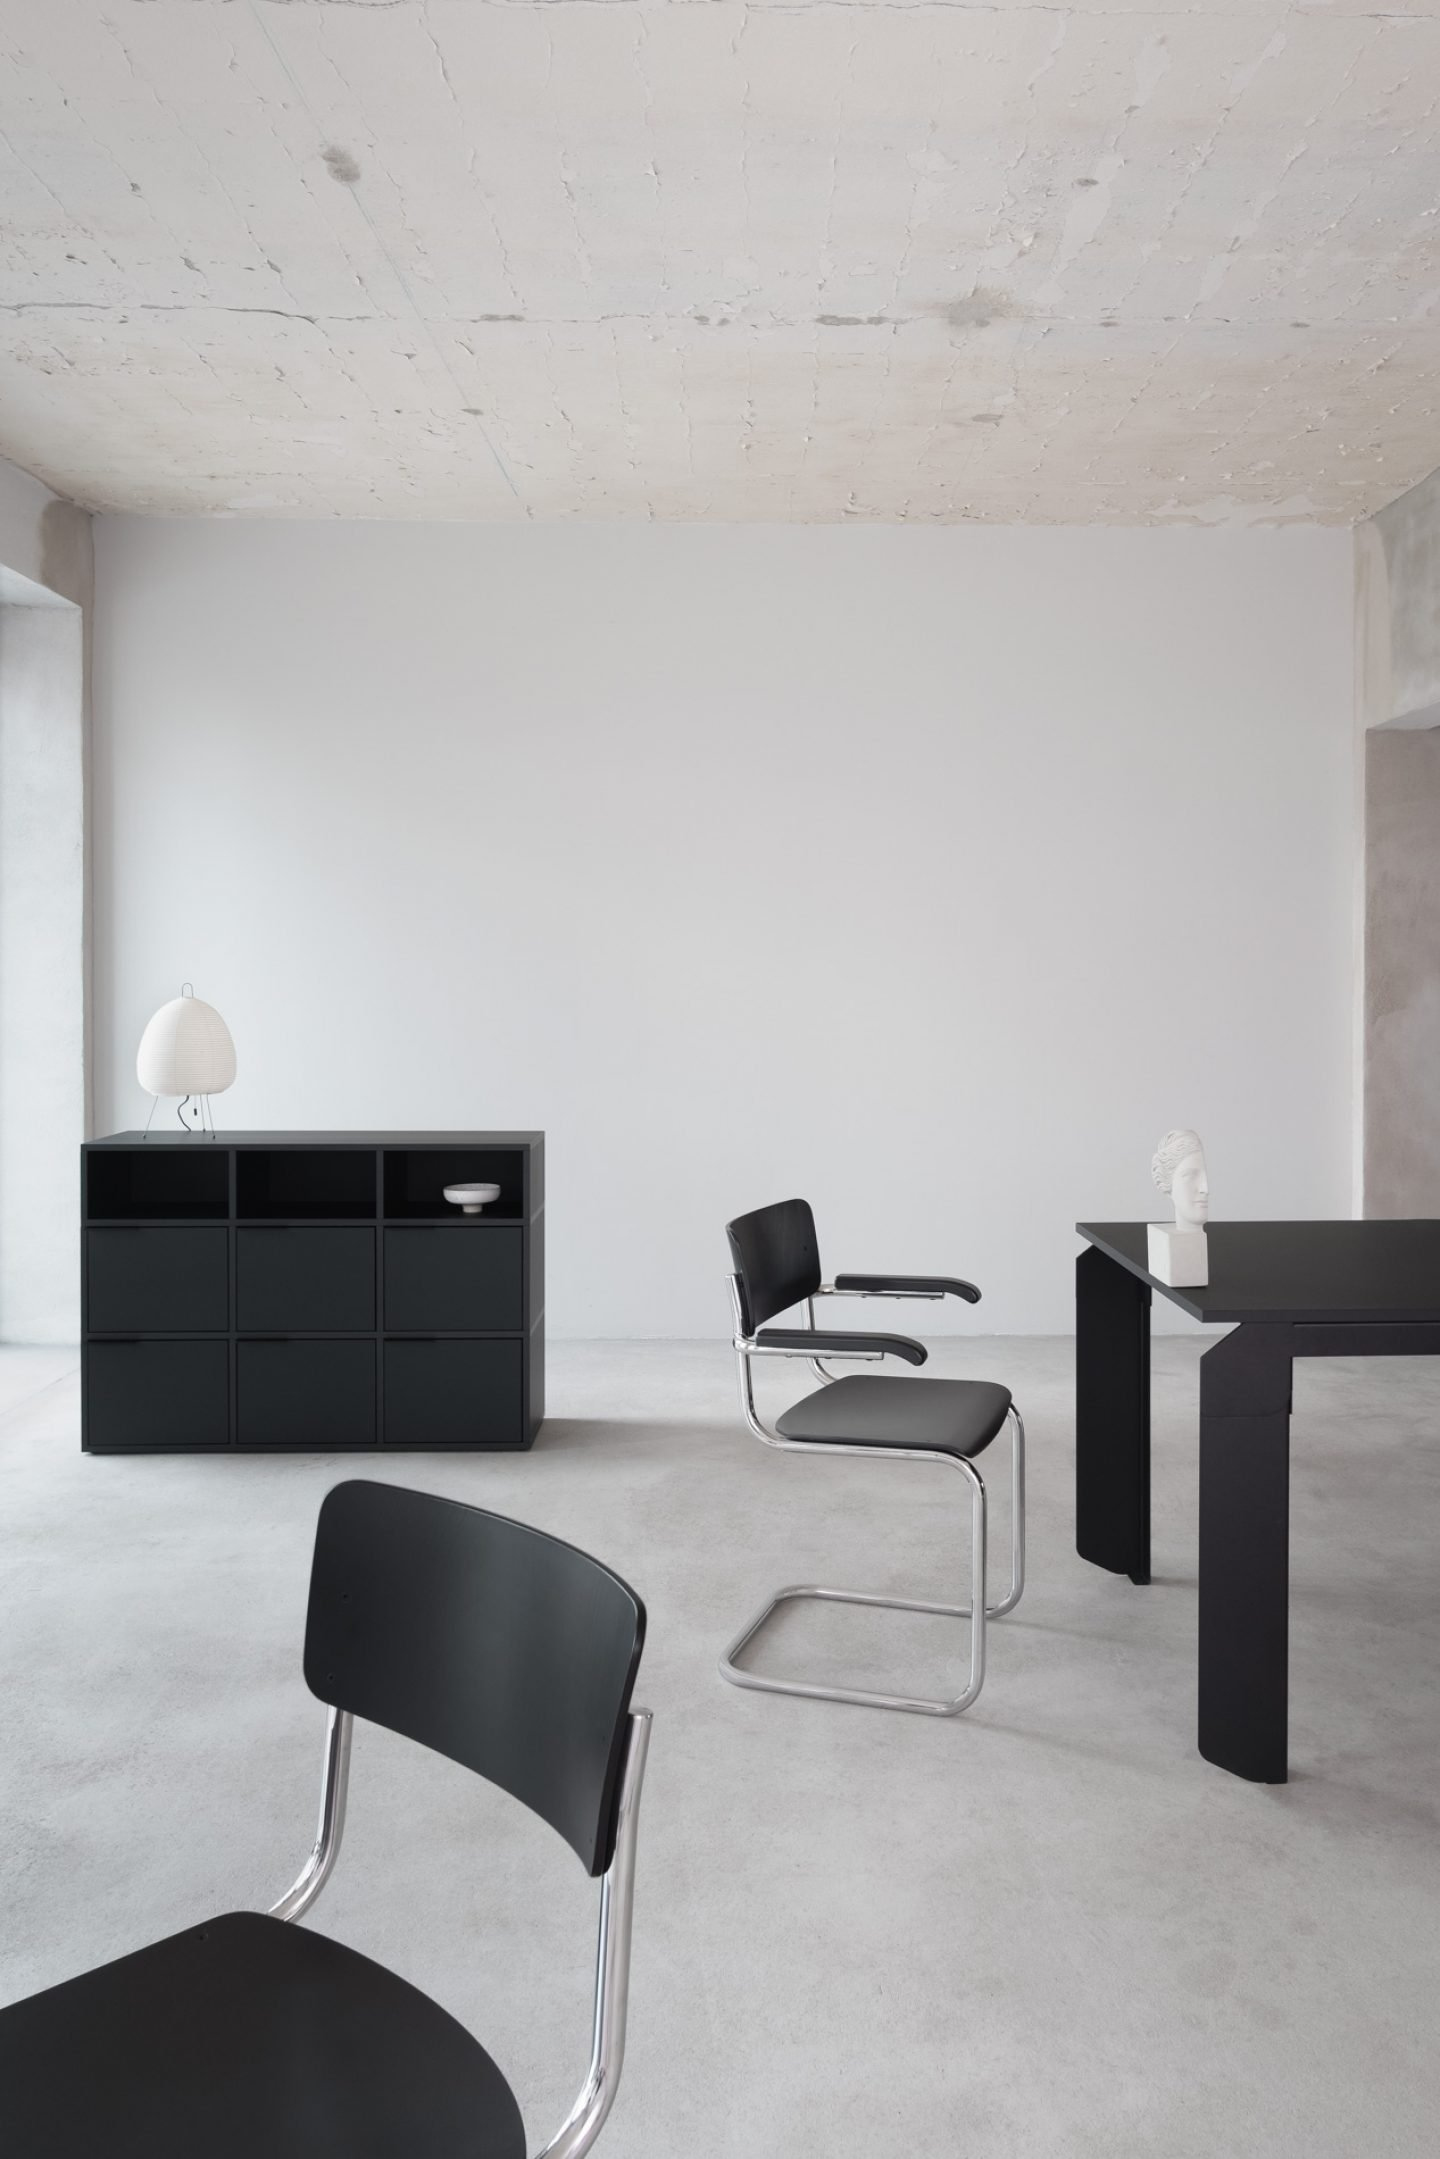 IGNANT-Tylko-shelf-design-Clemens-Poloczek--2